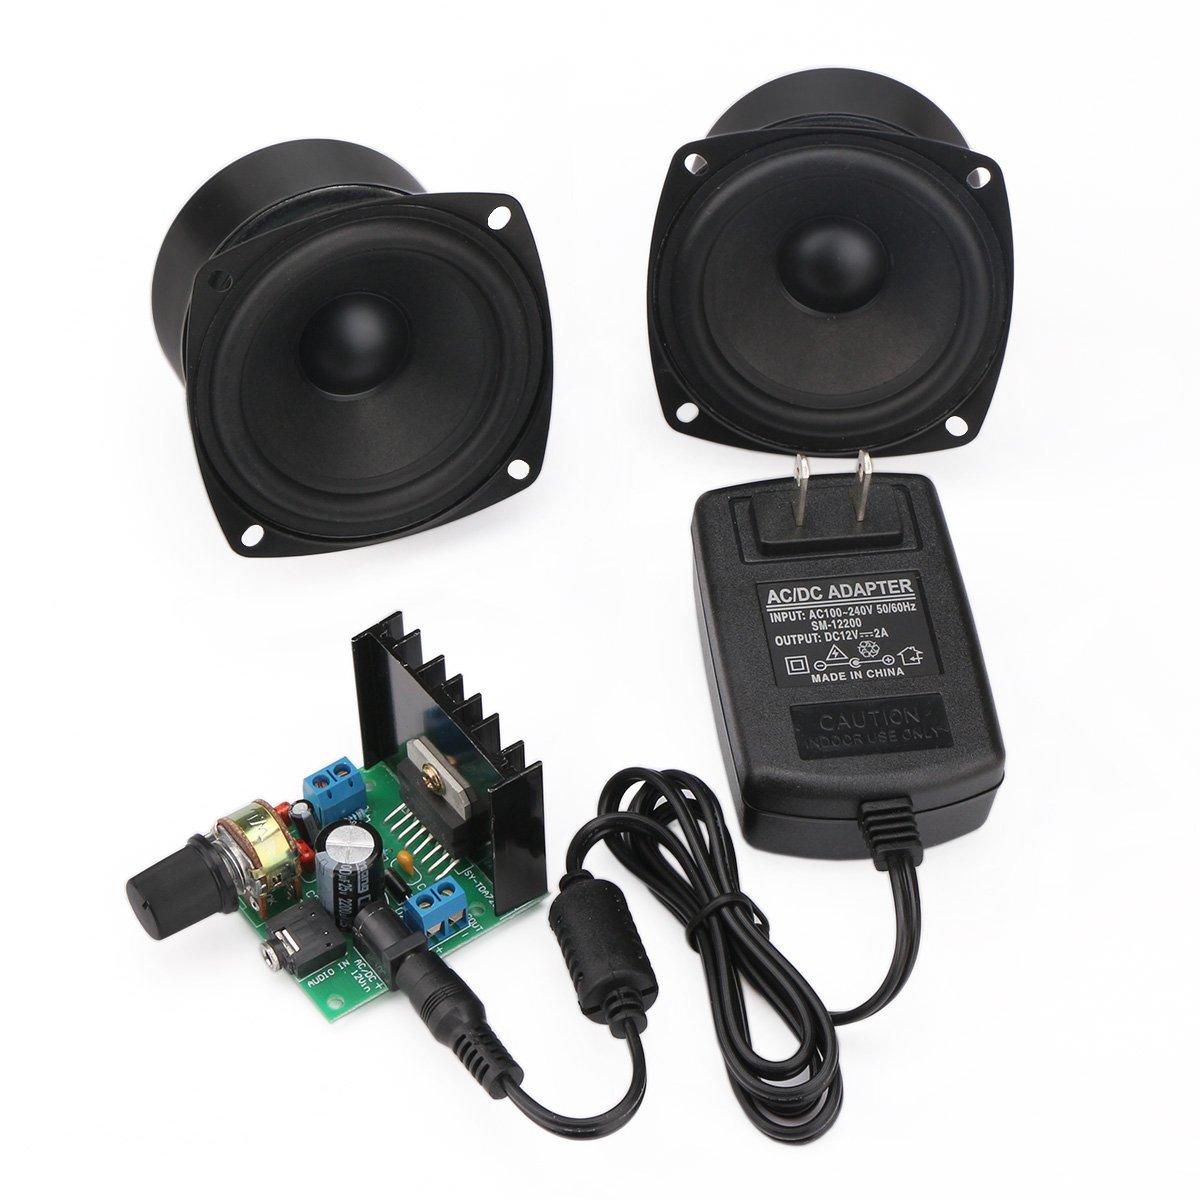 DROK Mini Ampli Board 6V to 18V Portable Stereo Amplifier Digital Amp Module Audio Amplify Dual Channel 15W+15W